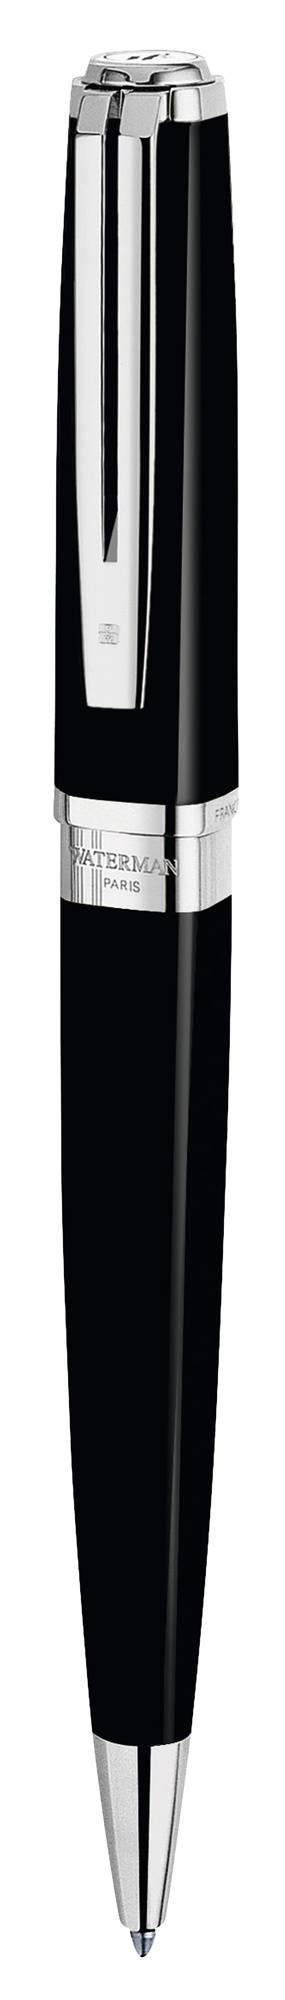 Ручка шариковая Waterman Exception Slim Black ST (S0637040) - фото 1